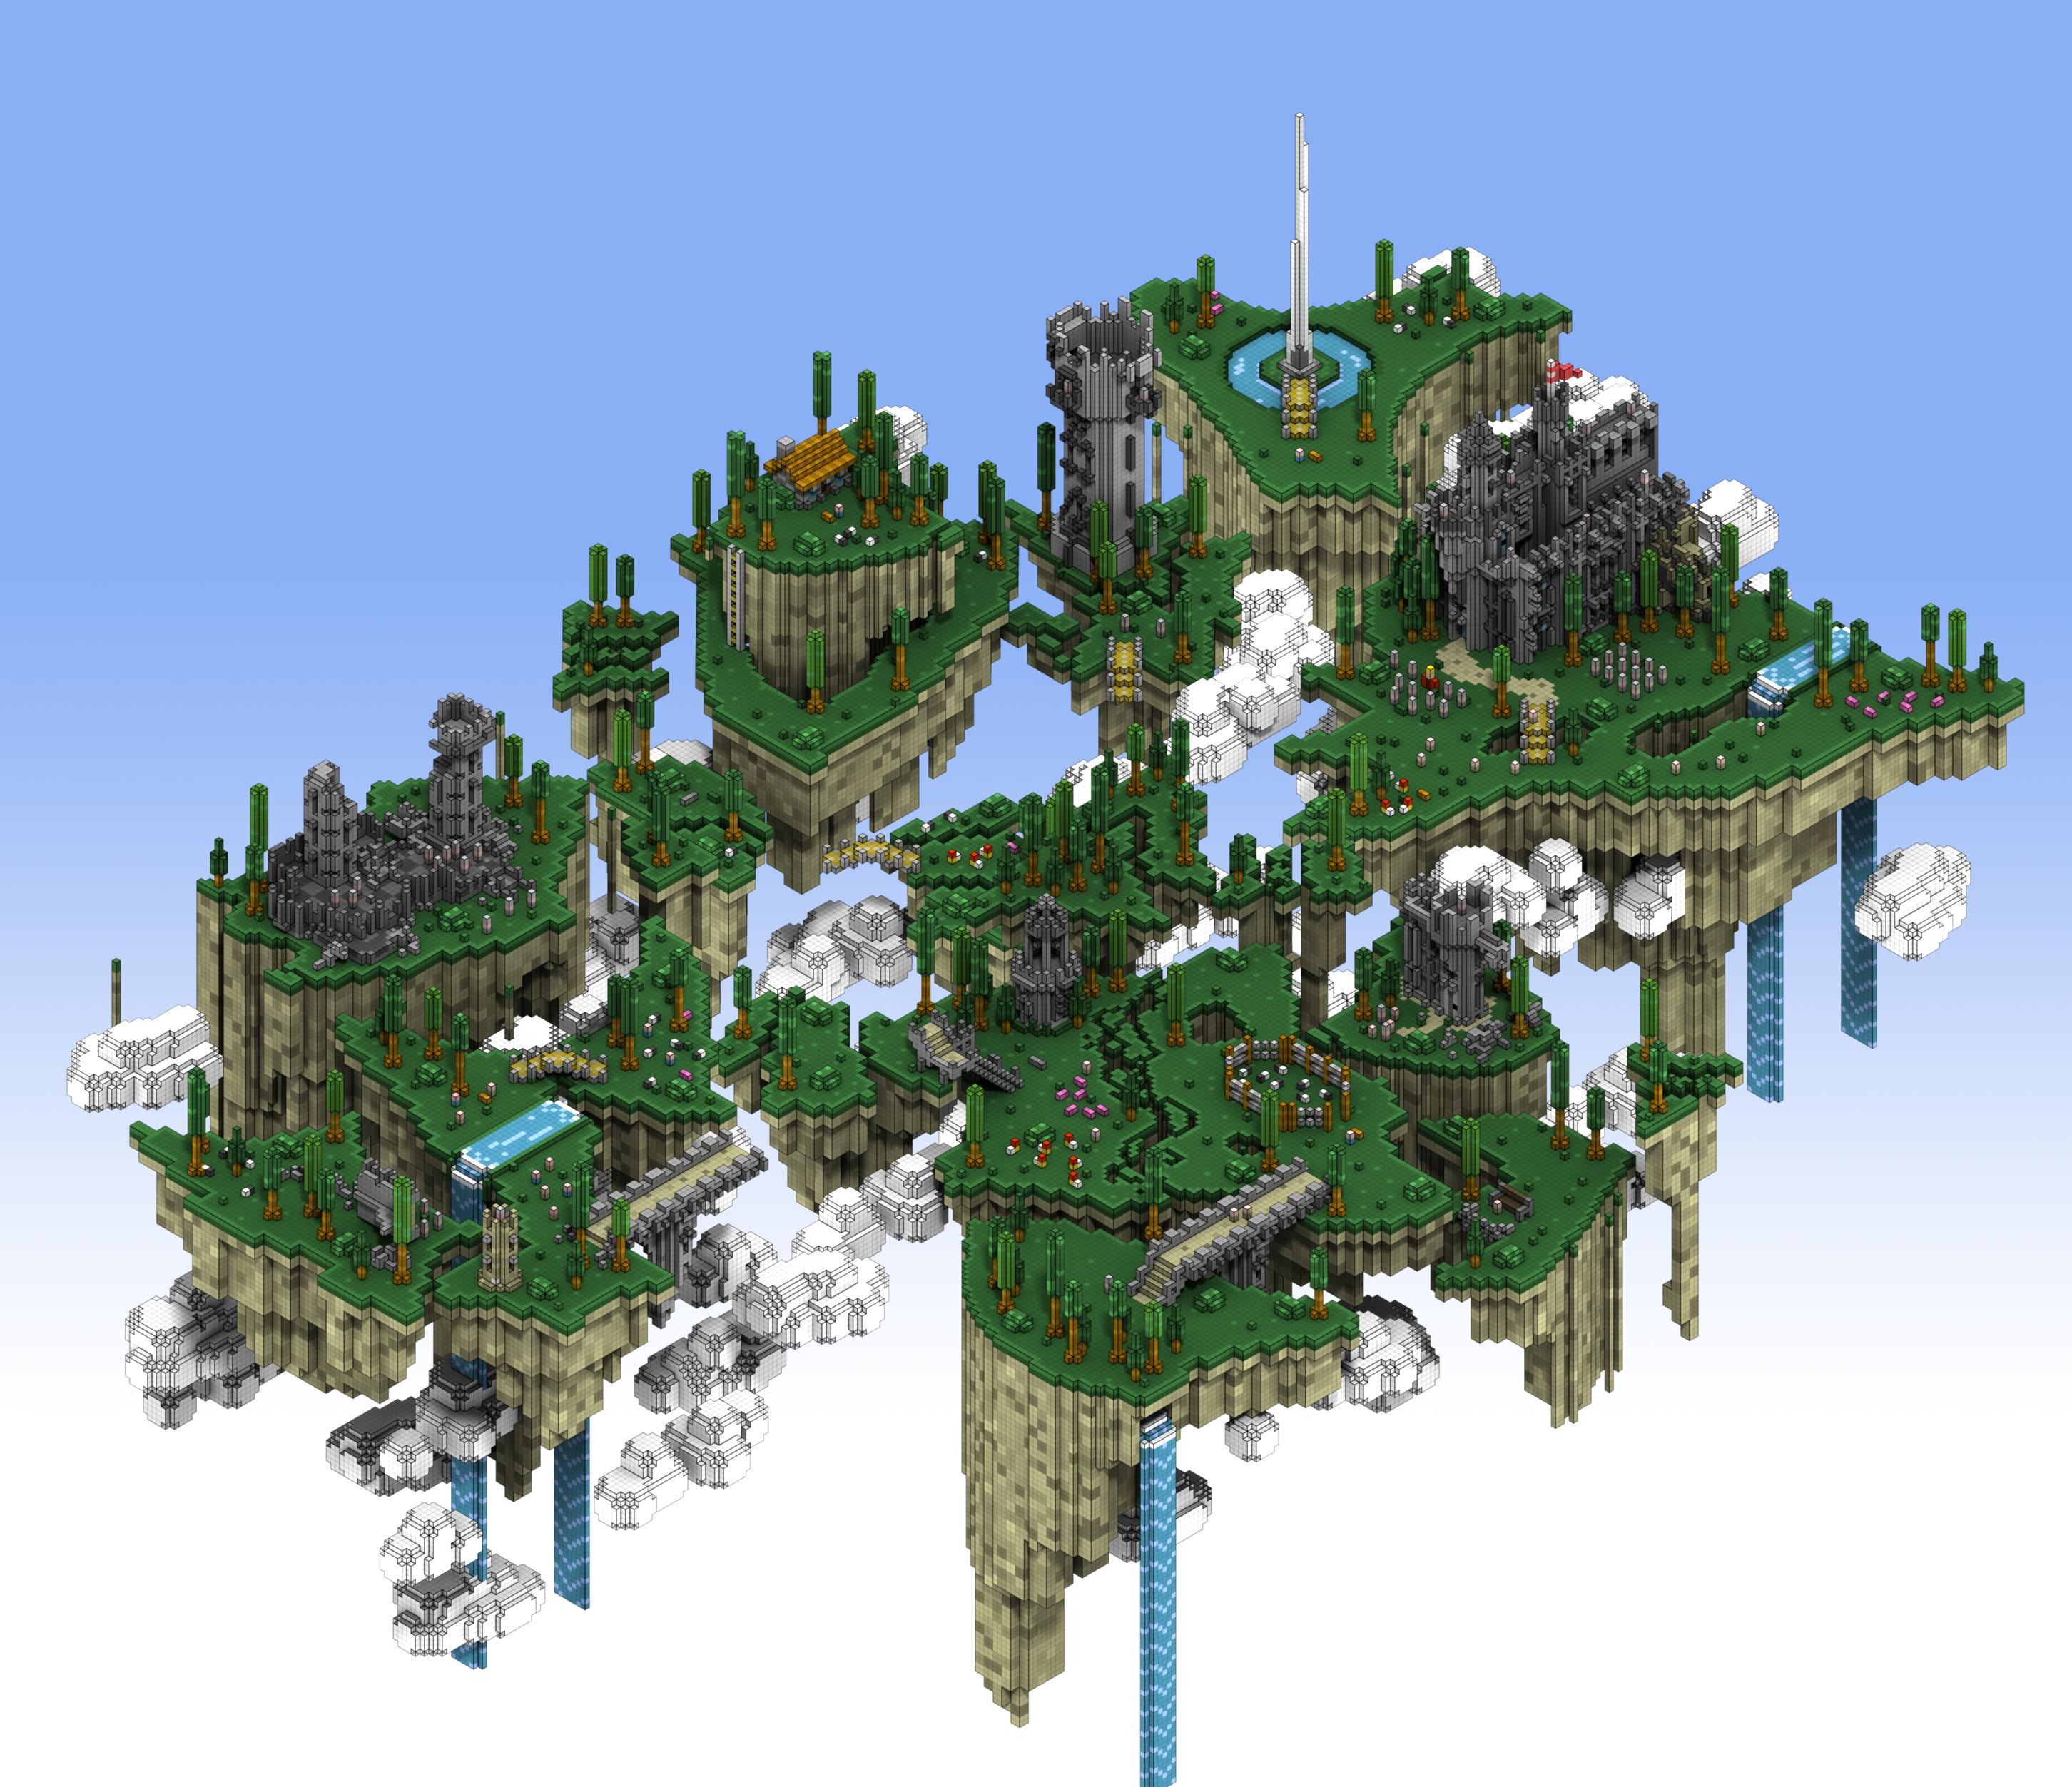 07 The Floating Islands Art Minecraft Designs Minecraft